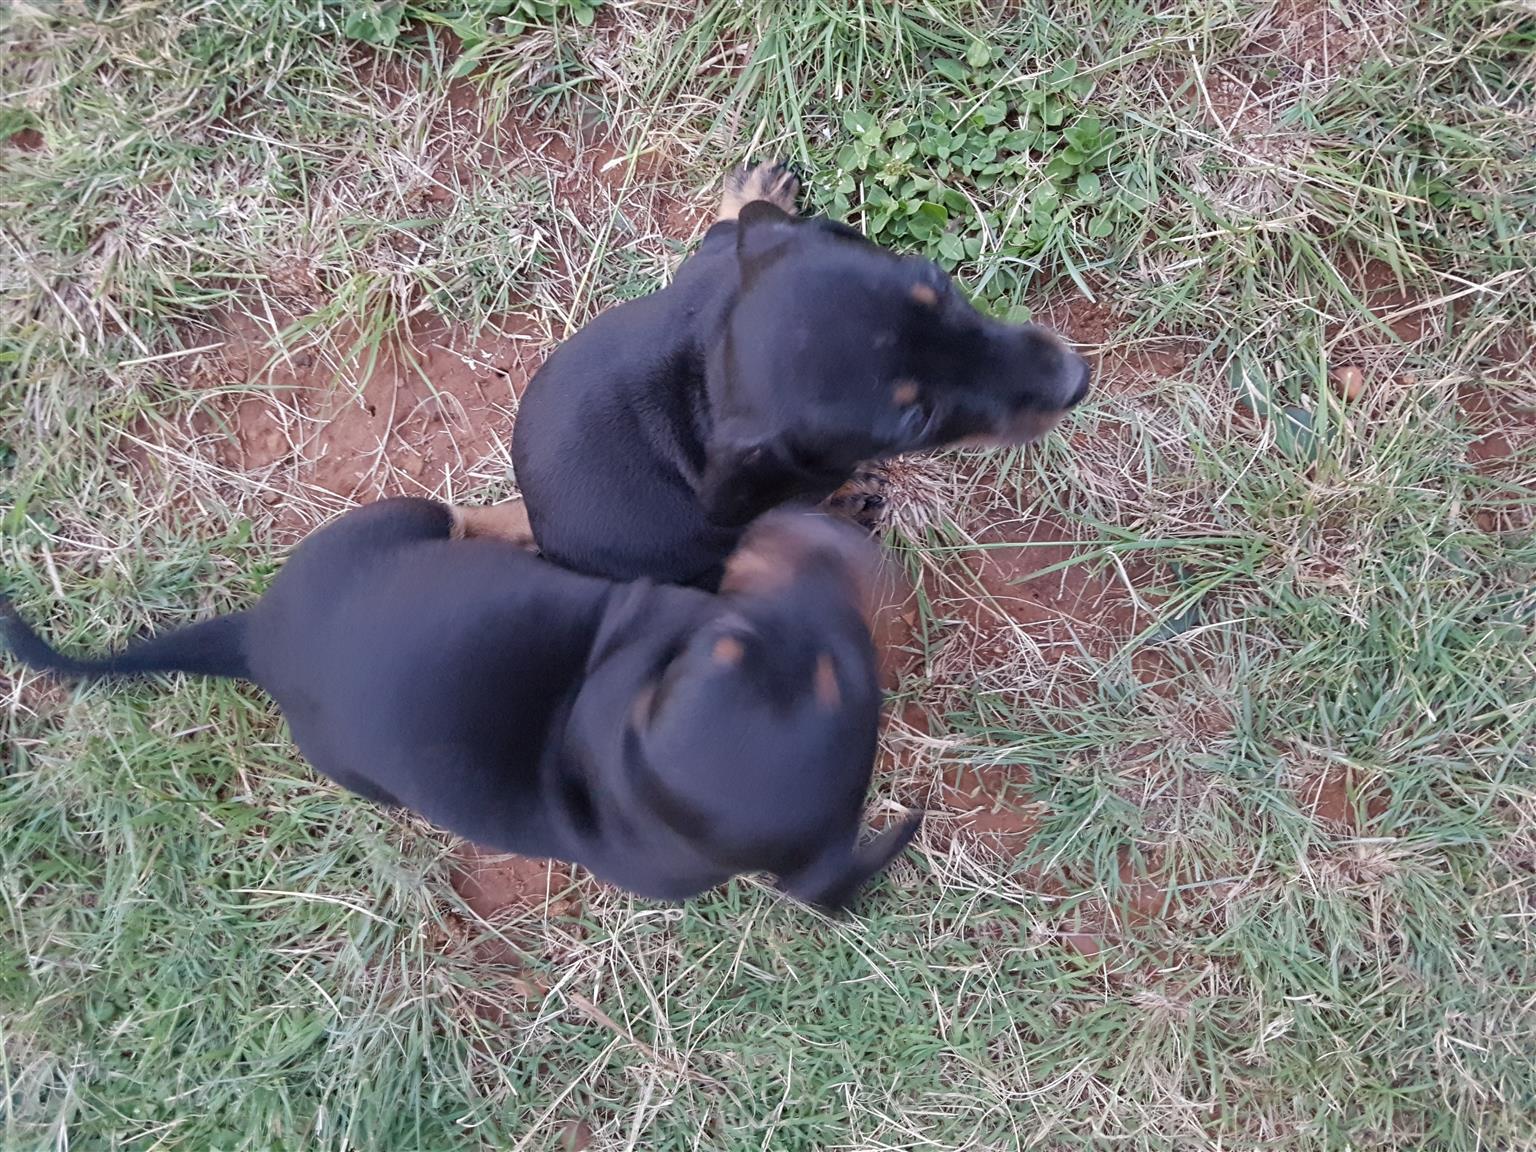 Dutchhound / Worshondjies / Daffels